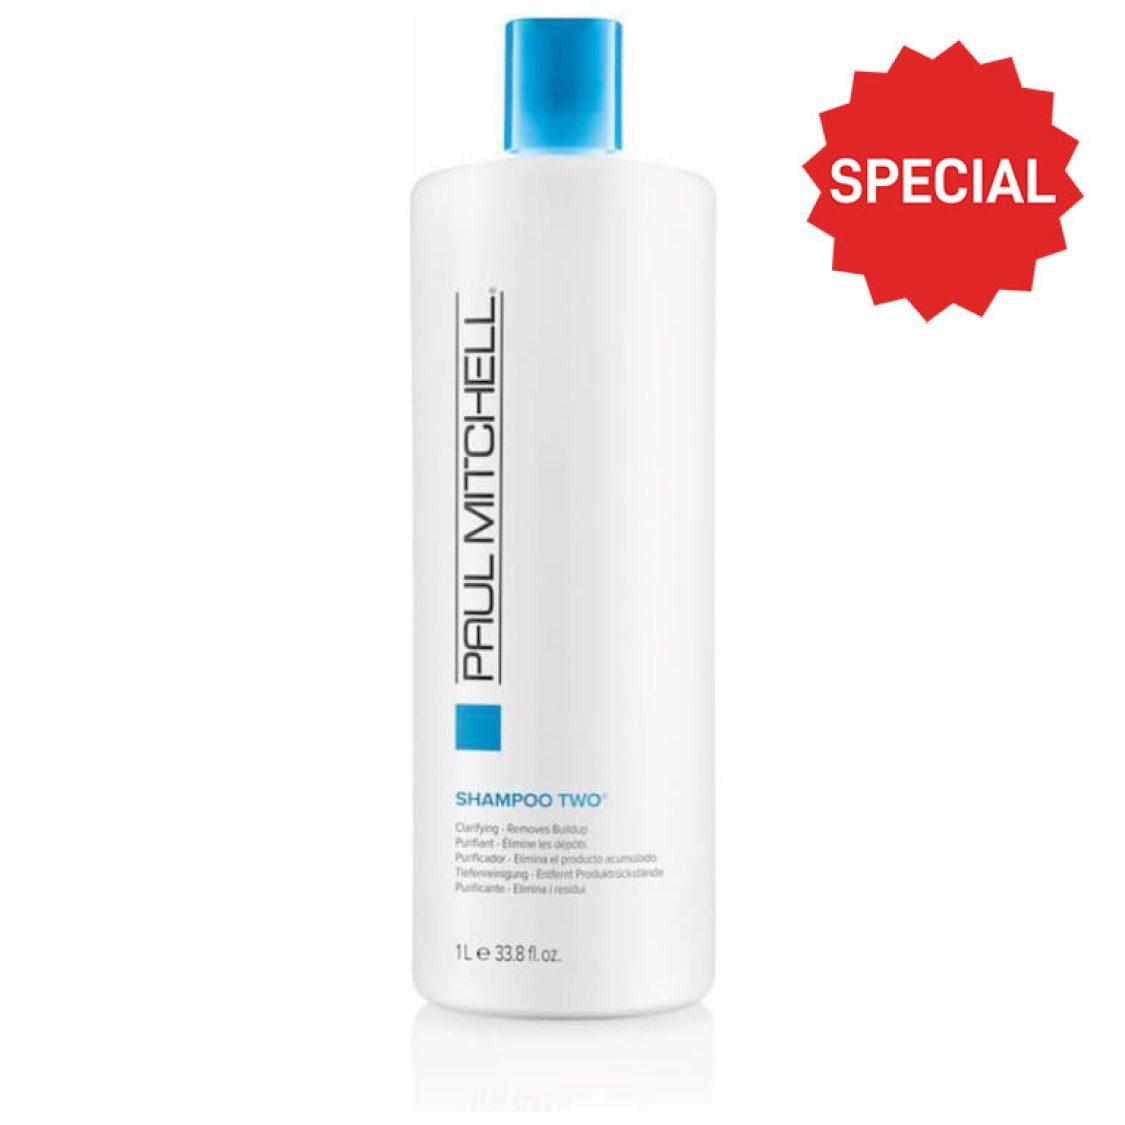 Paul Mitchell - Clarifying - Shampoo Two 1L